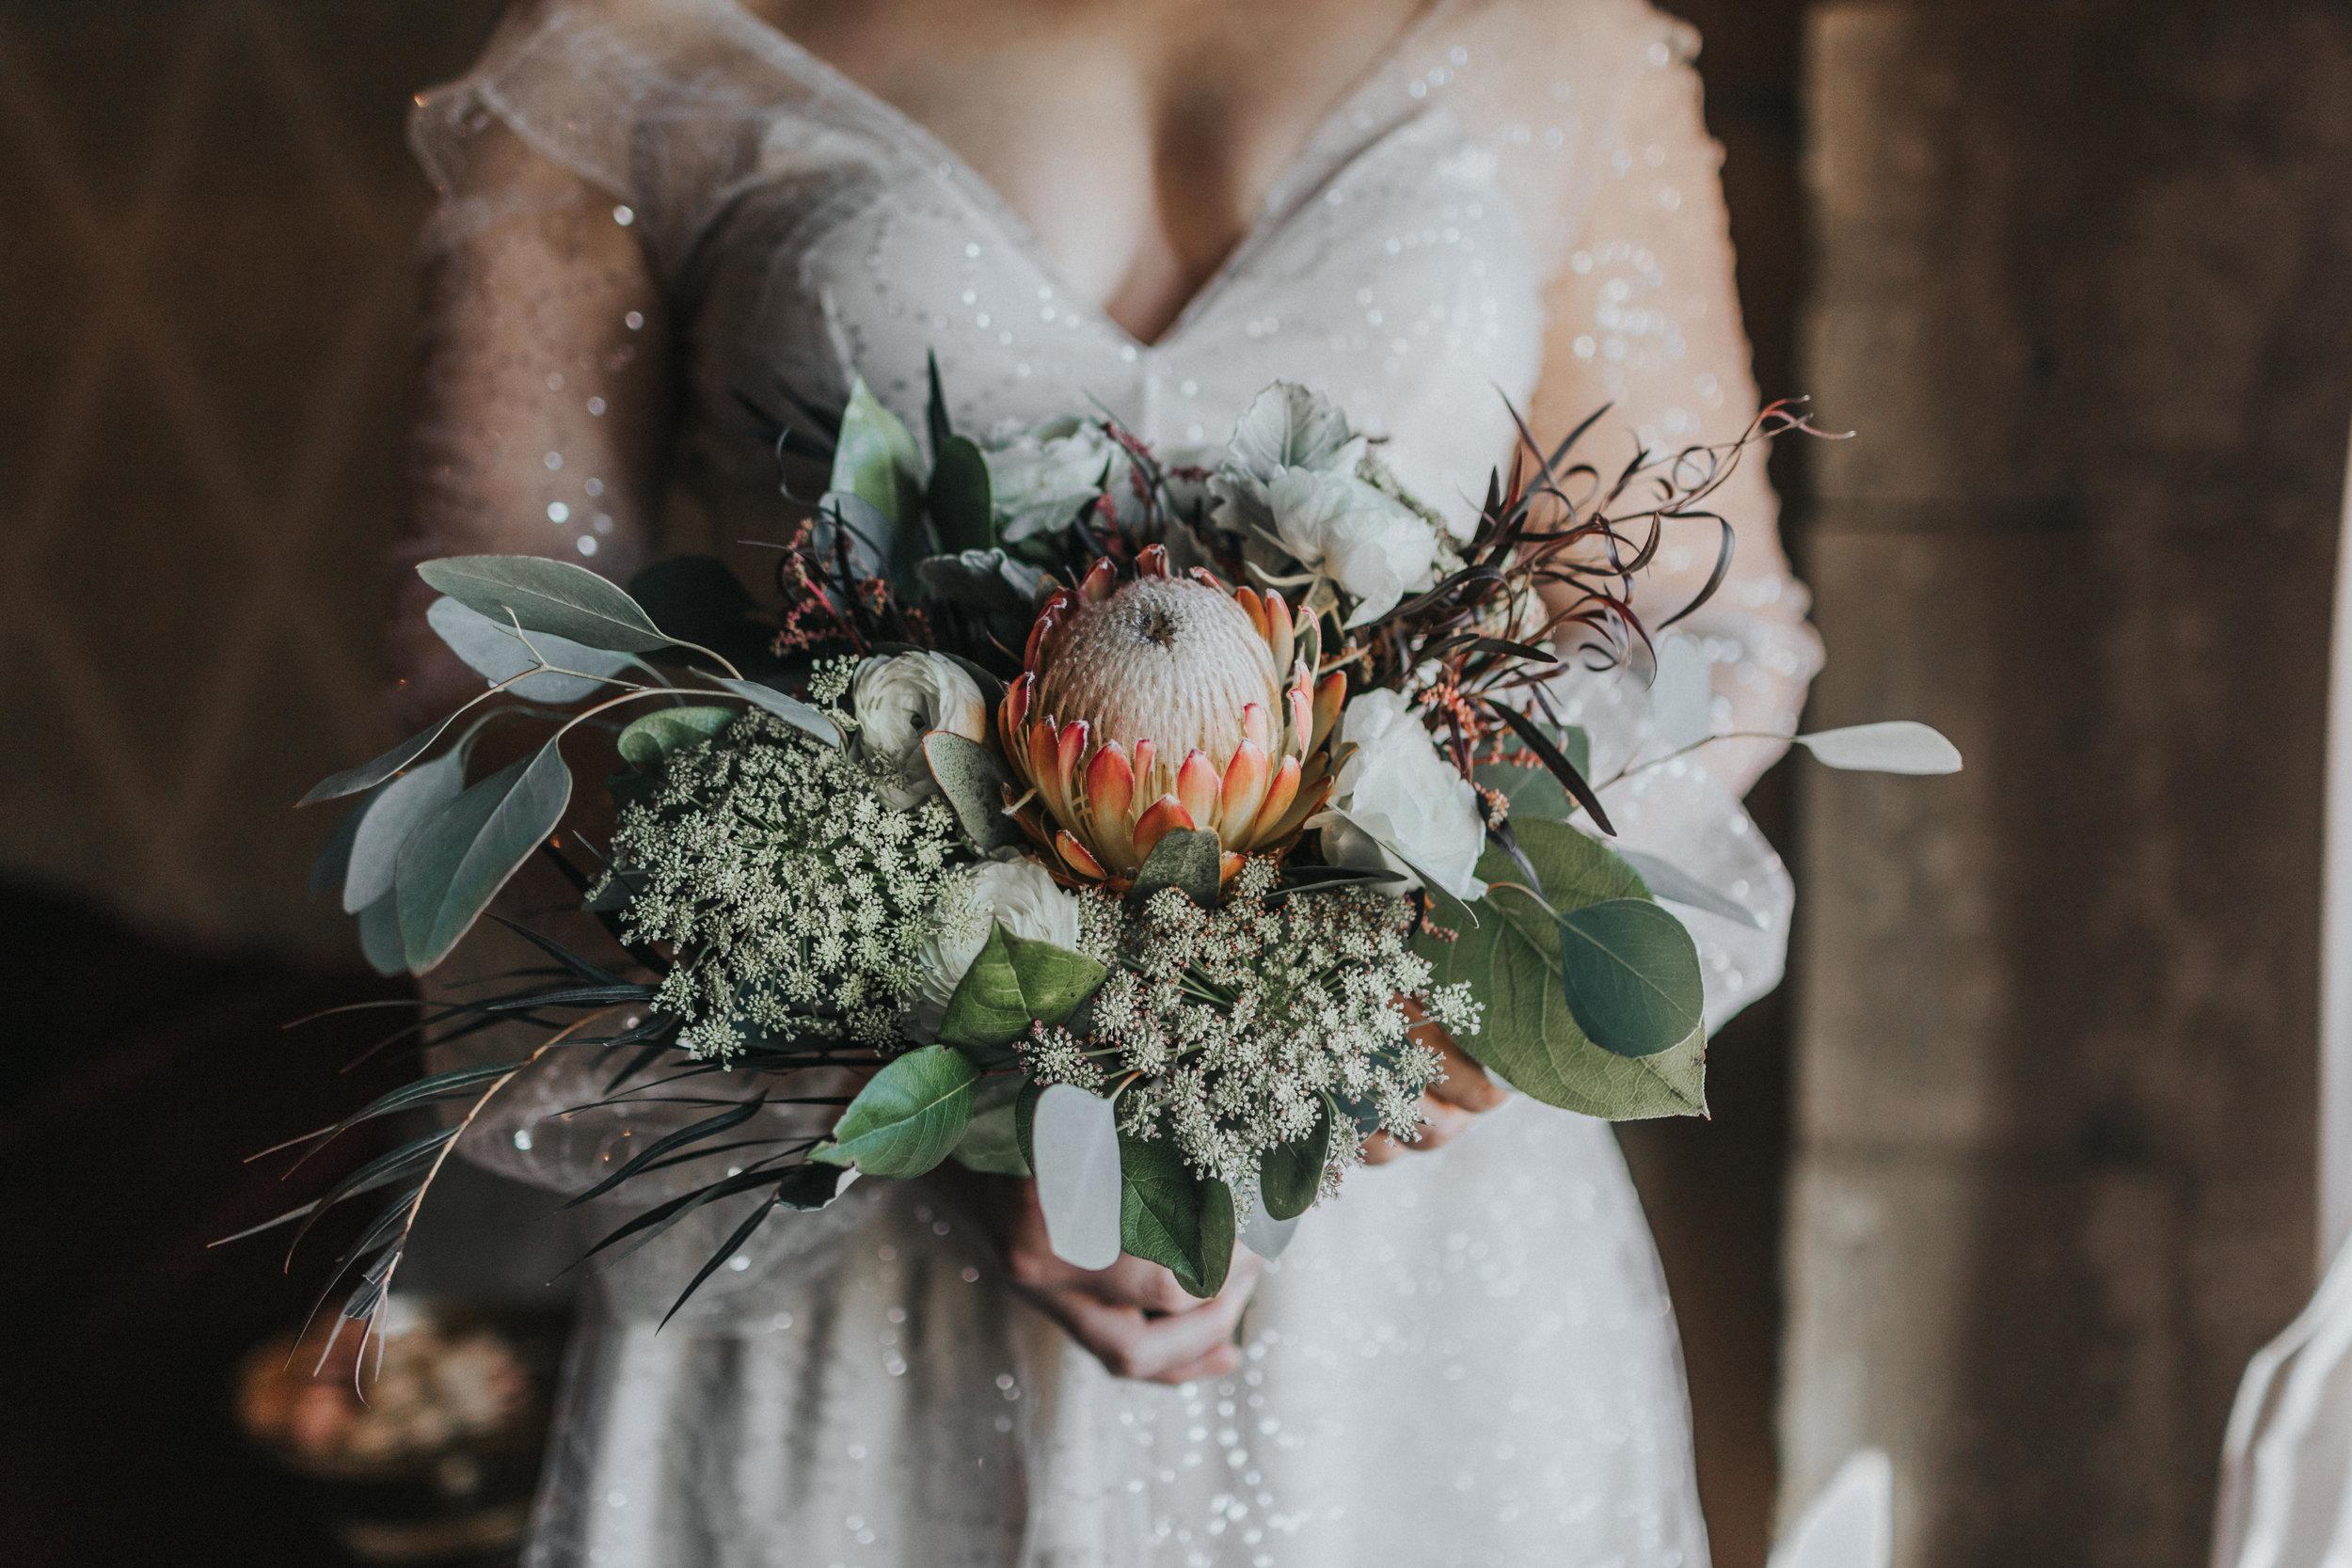 small-wedding-venue-omaha-tiny-luxe-elopement